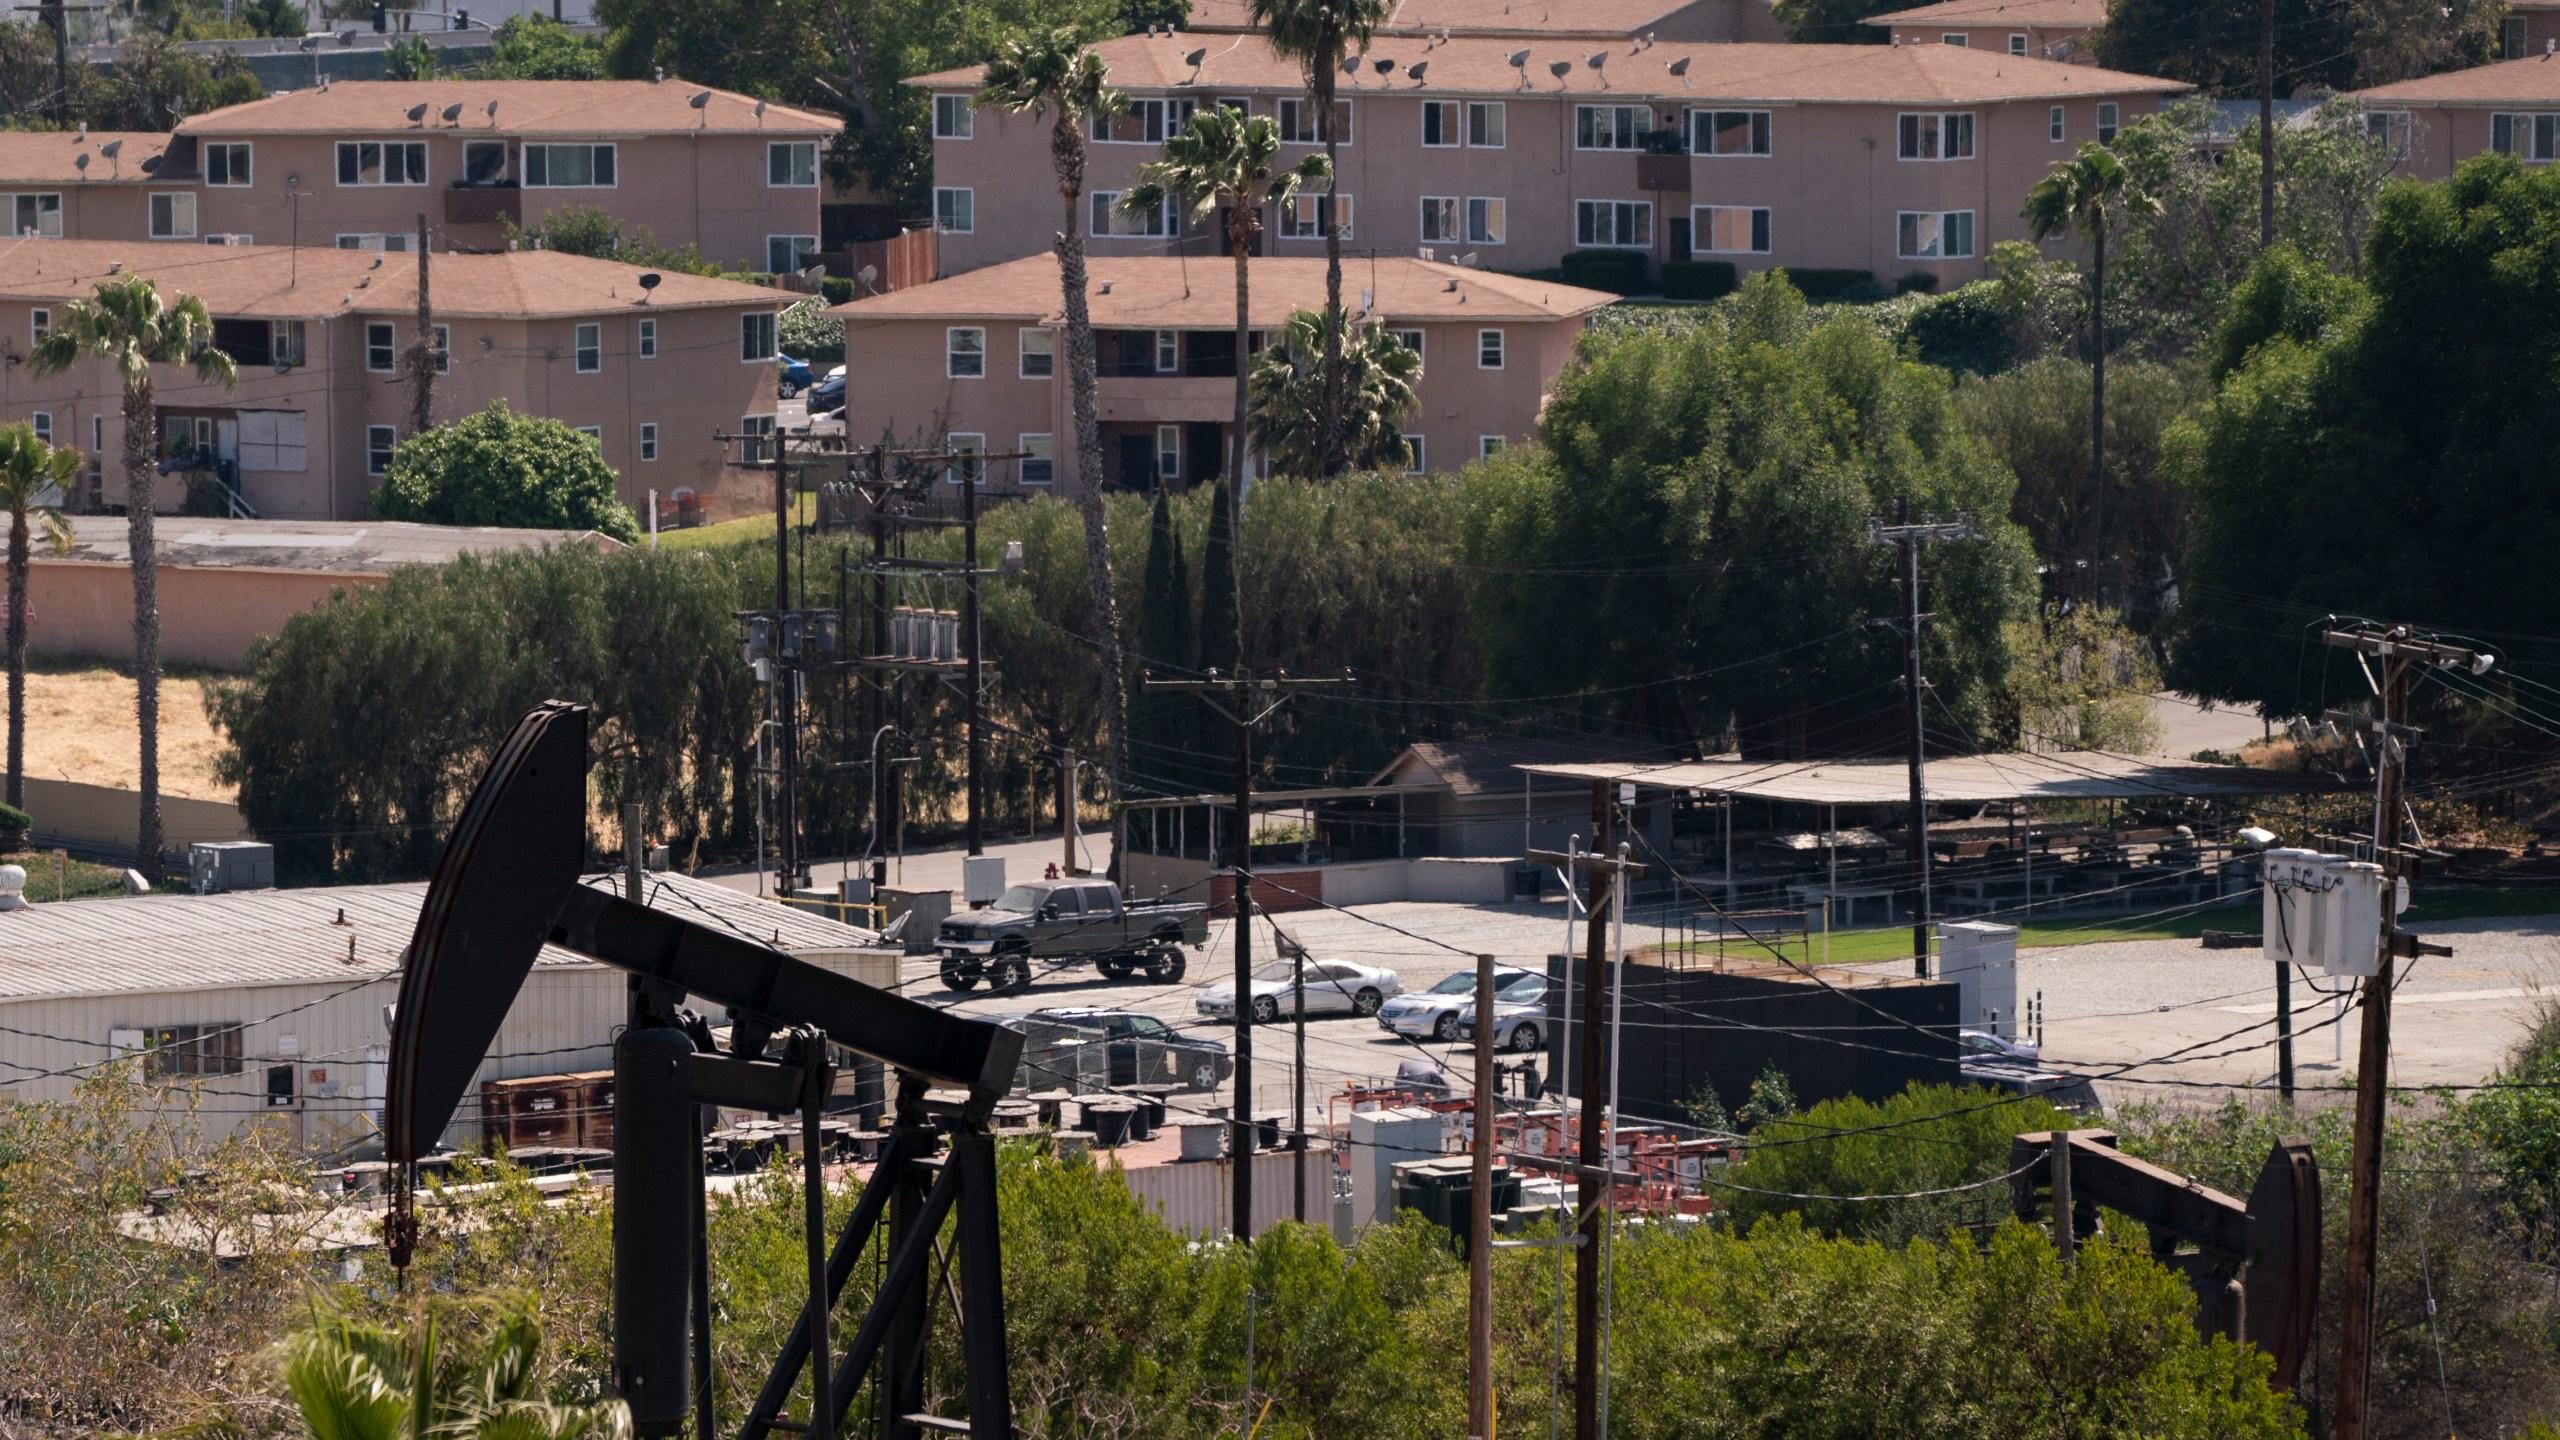 Apartment buildings are seen behind pump jacks operating at the Inglewood Oil Field in Los Angeles, Tuesday, May 18, 2021. (AP Photo/Jae C. Hong)